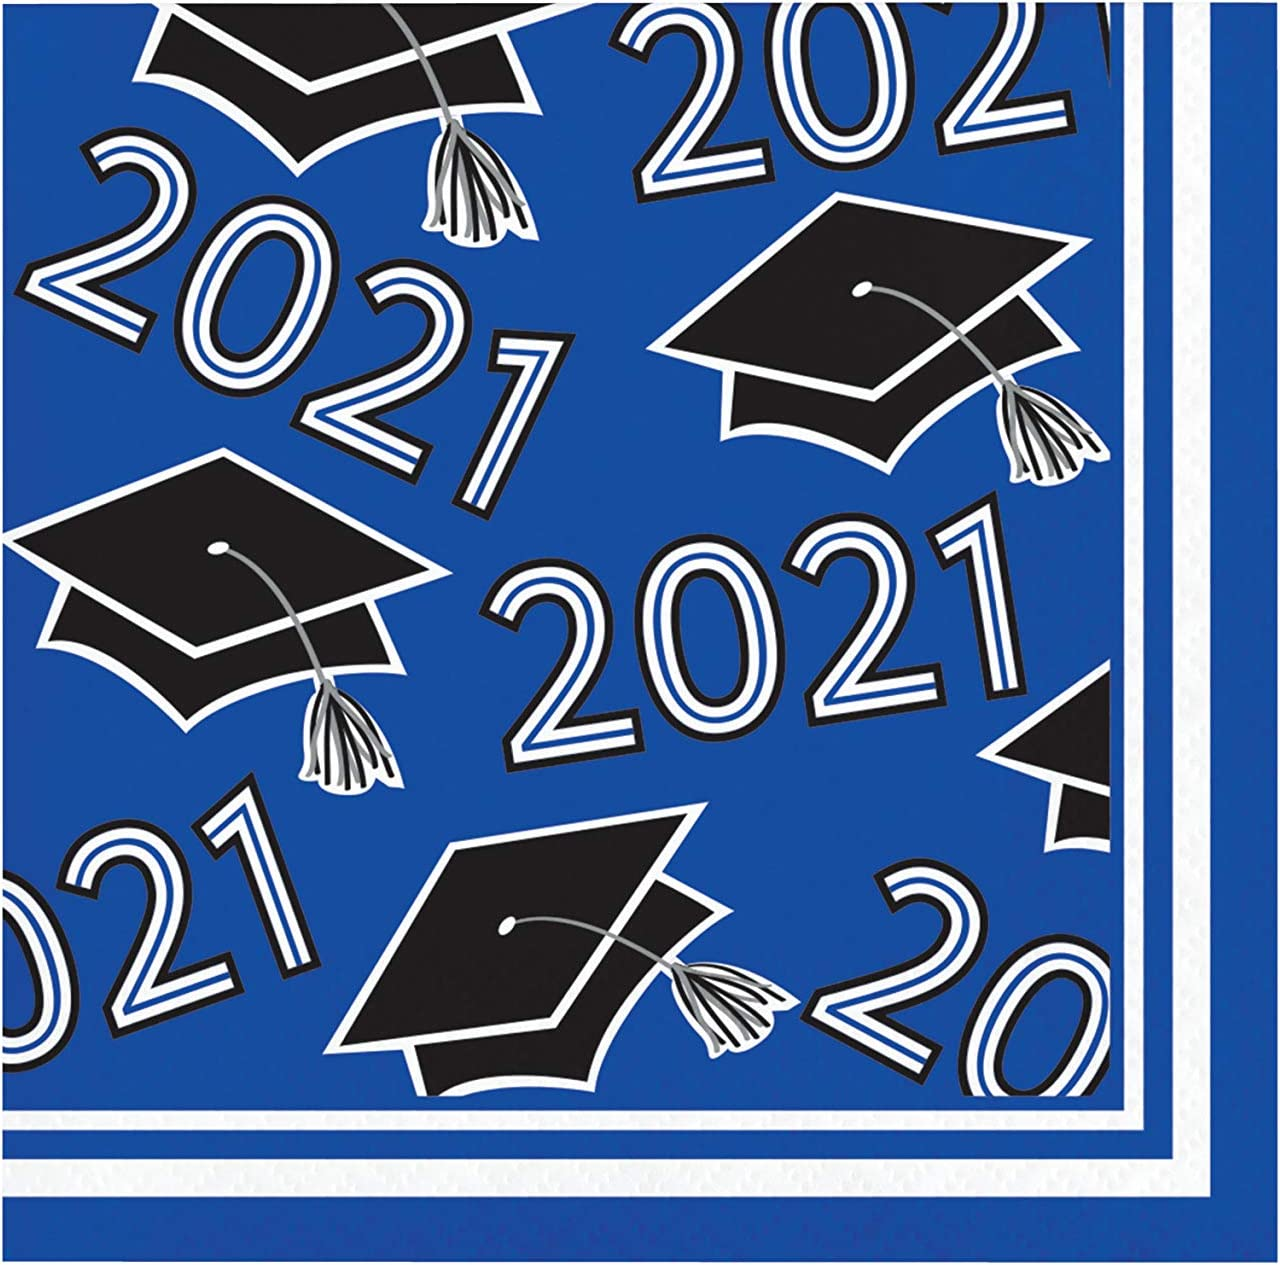 Creative Converting Cobalt Blue 2021 Grad Beverage Napkins, 5